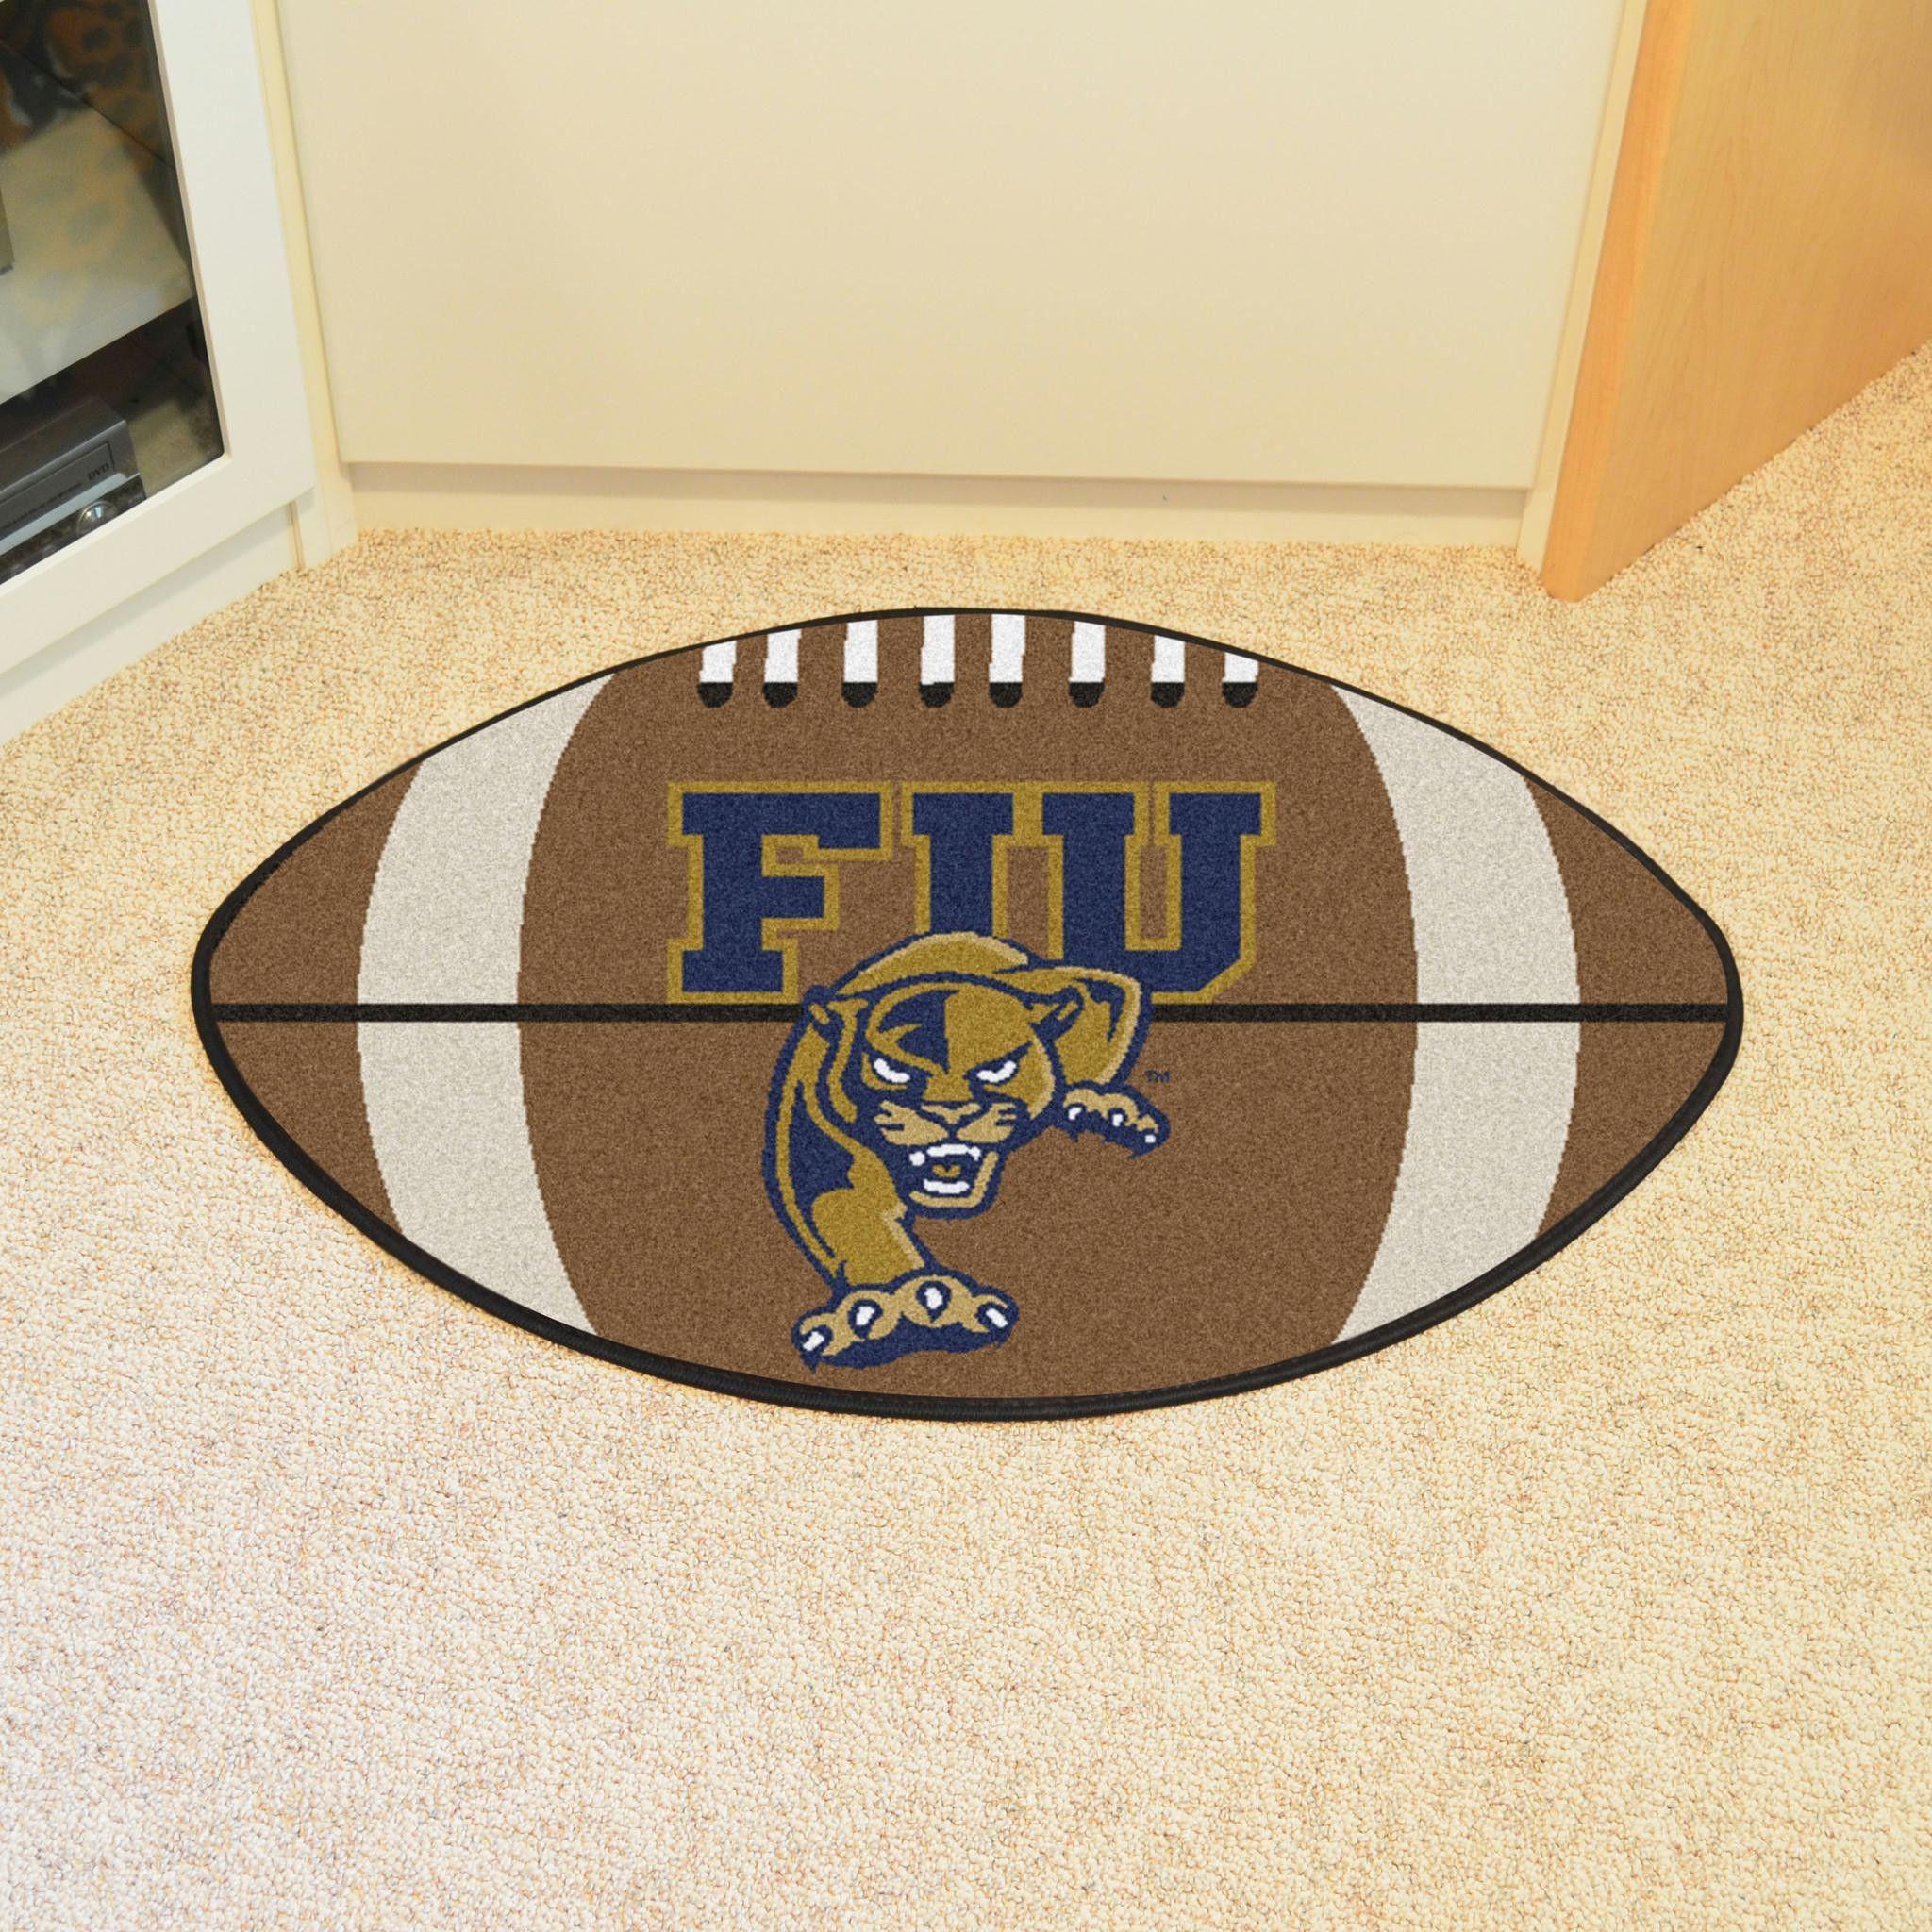 Florida international university football rug x products